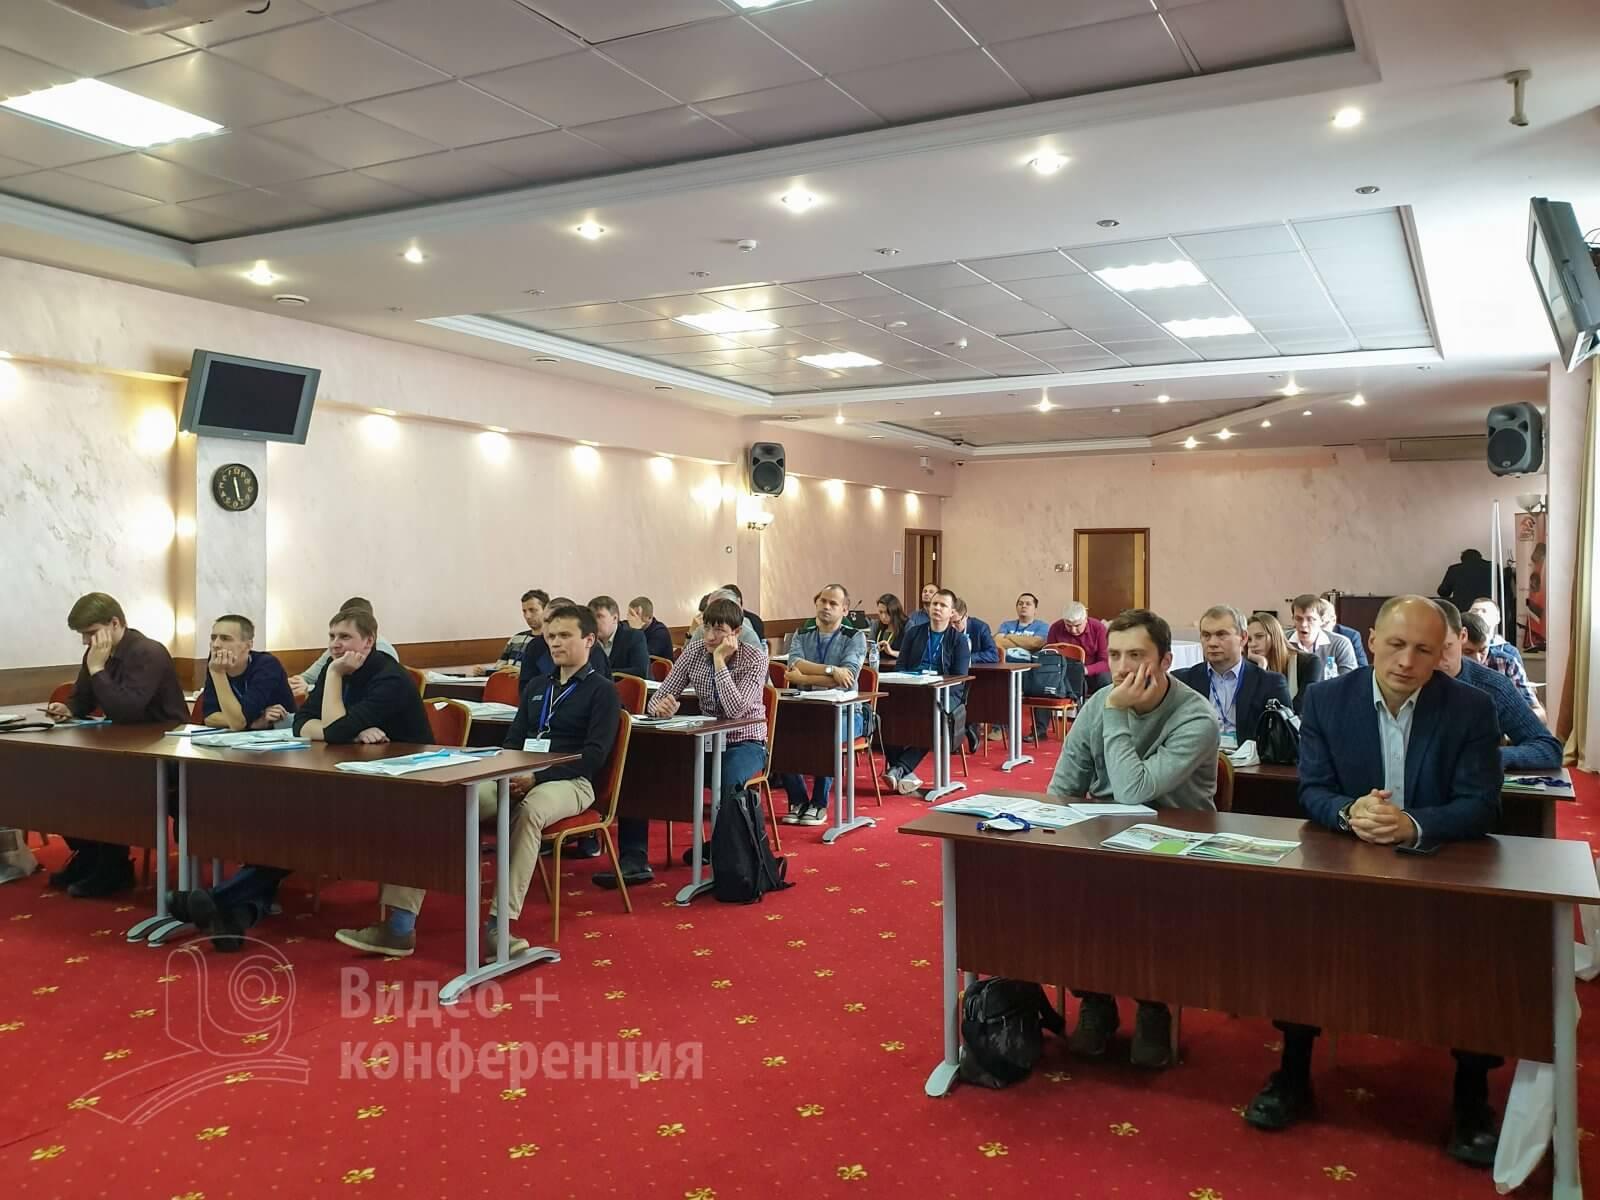 Осенние семинары о TrueConf Server 4.5 и технологиях видеосвязи 1